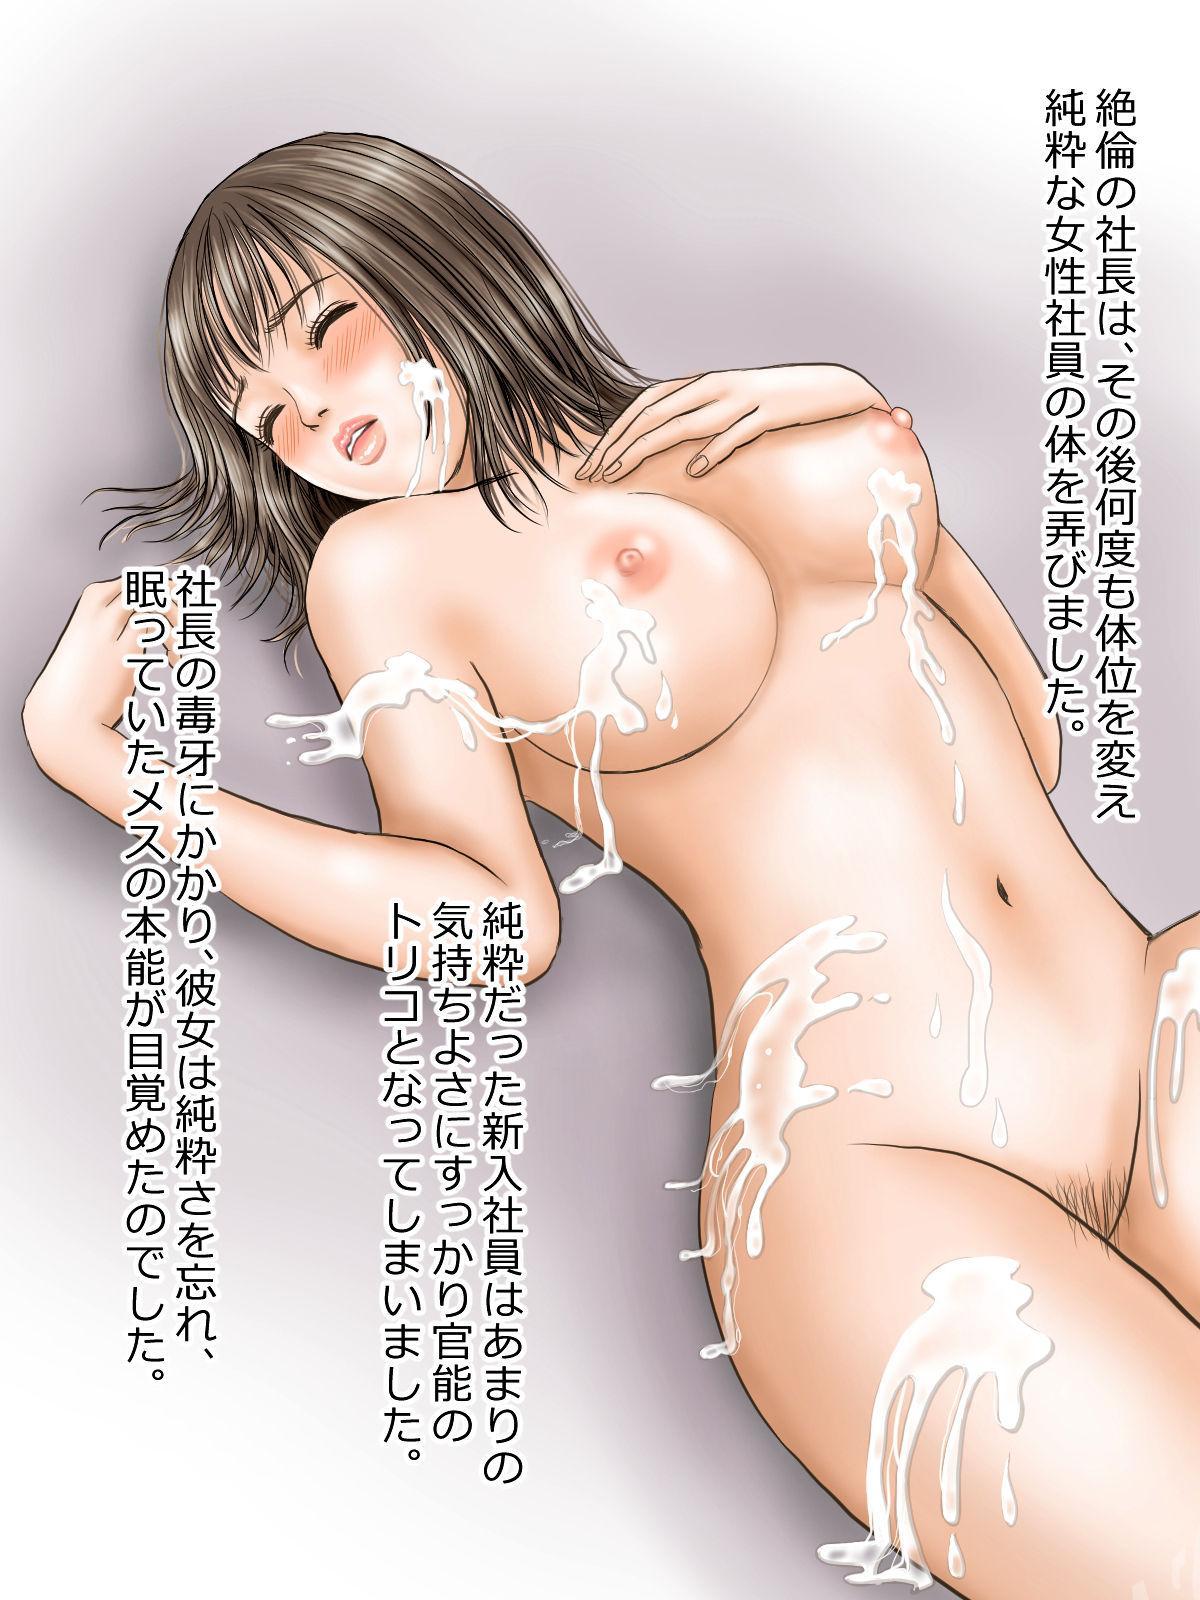 Yuumei Kigyou no Jittai 20